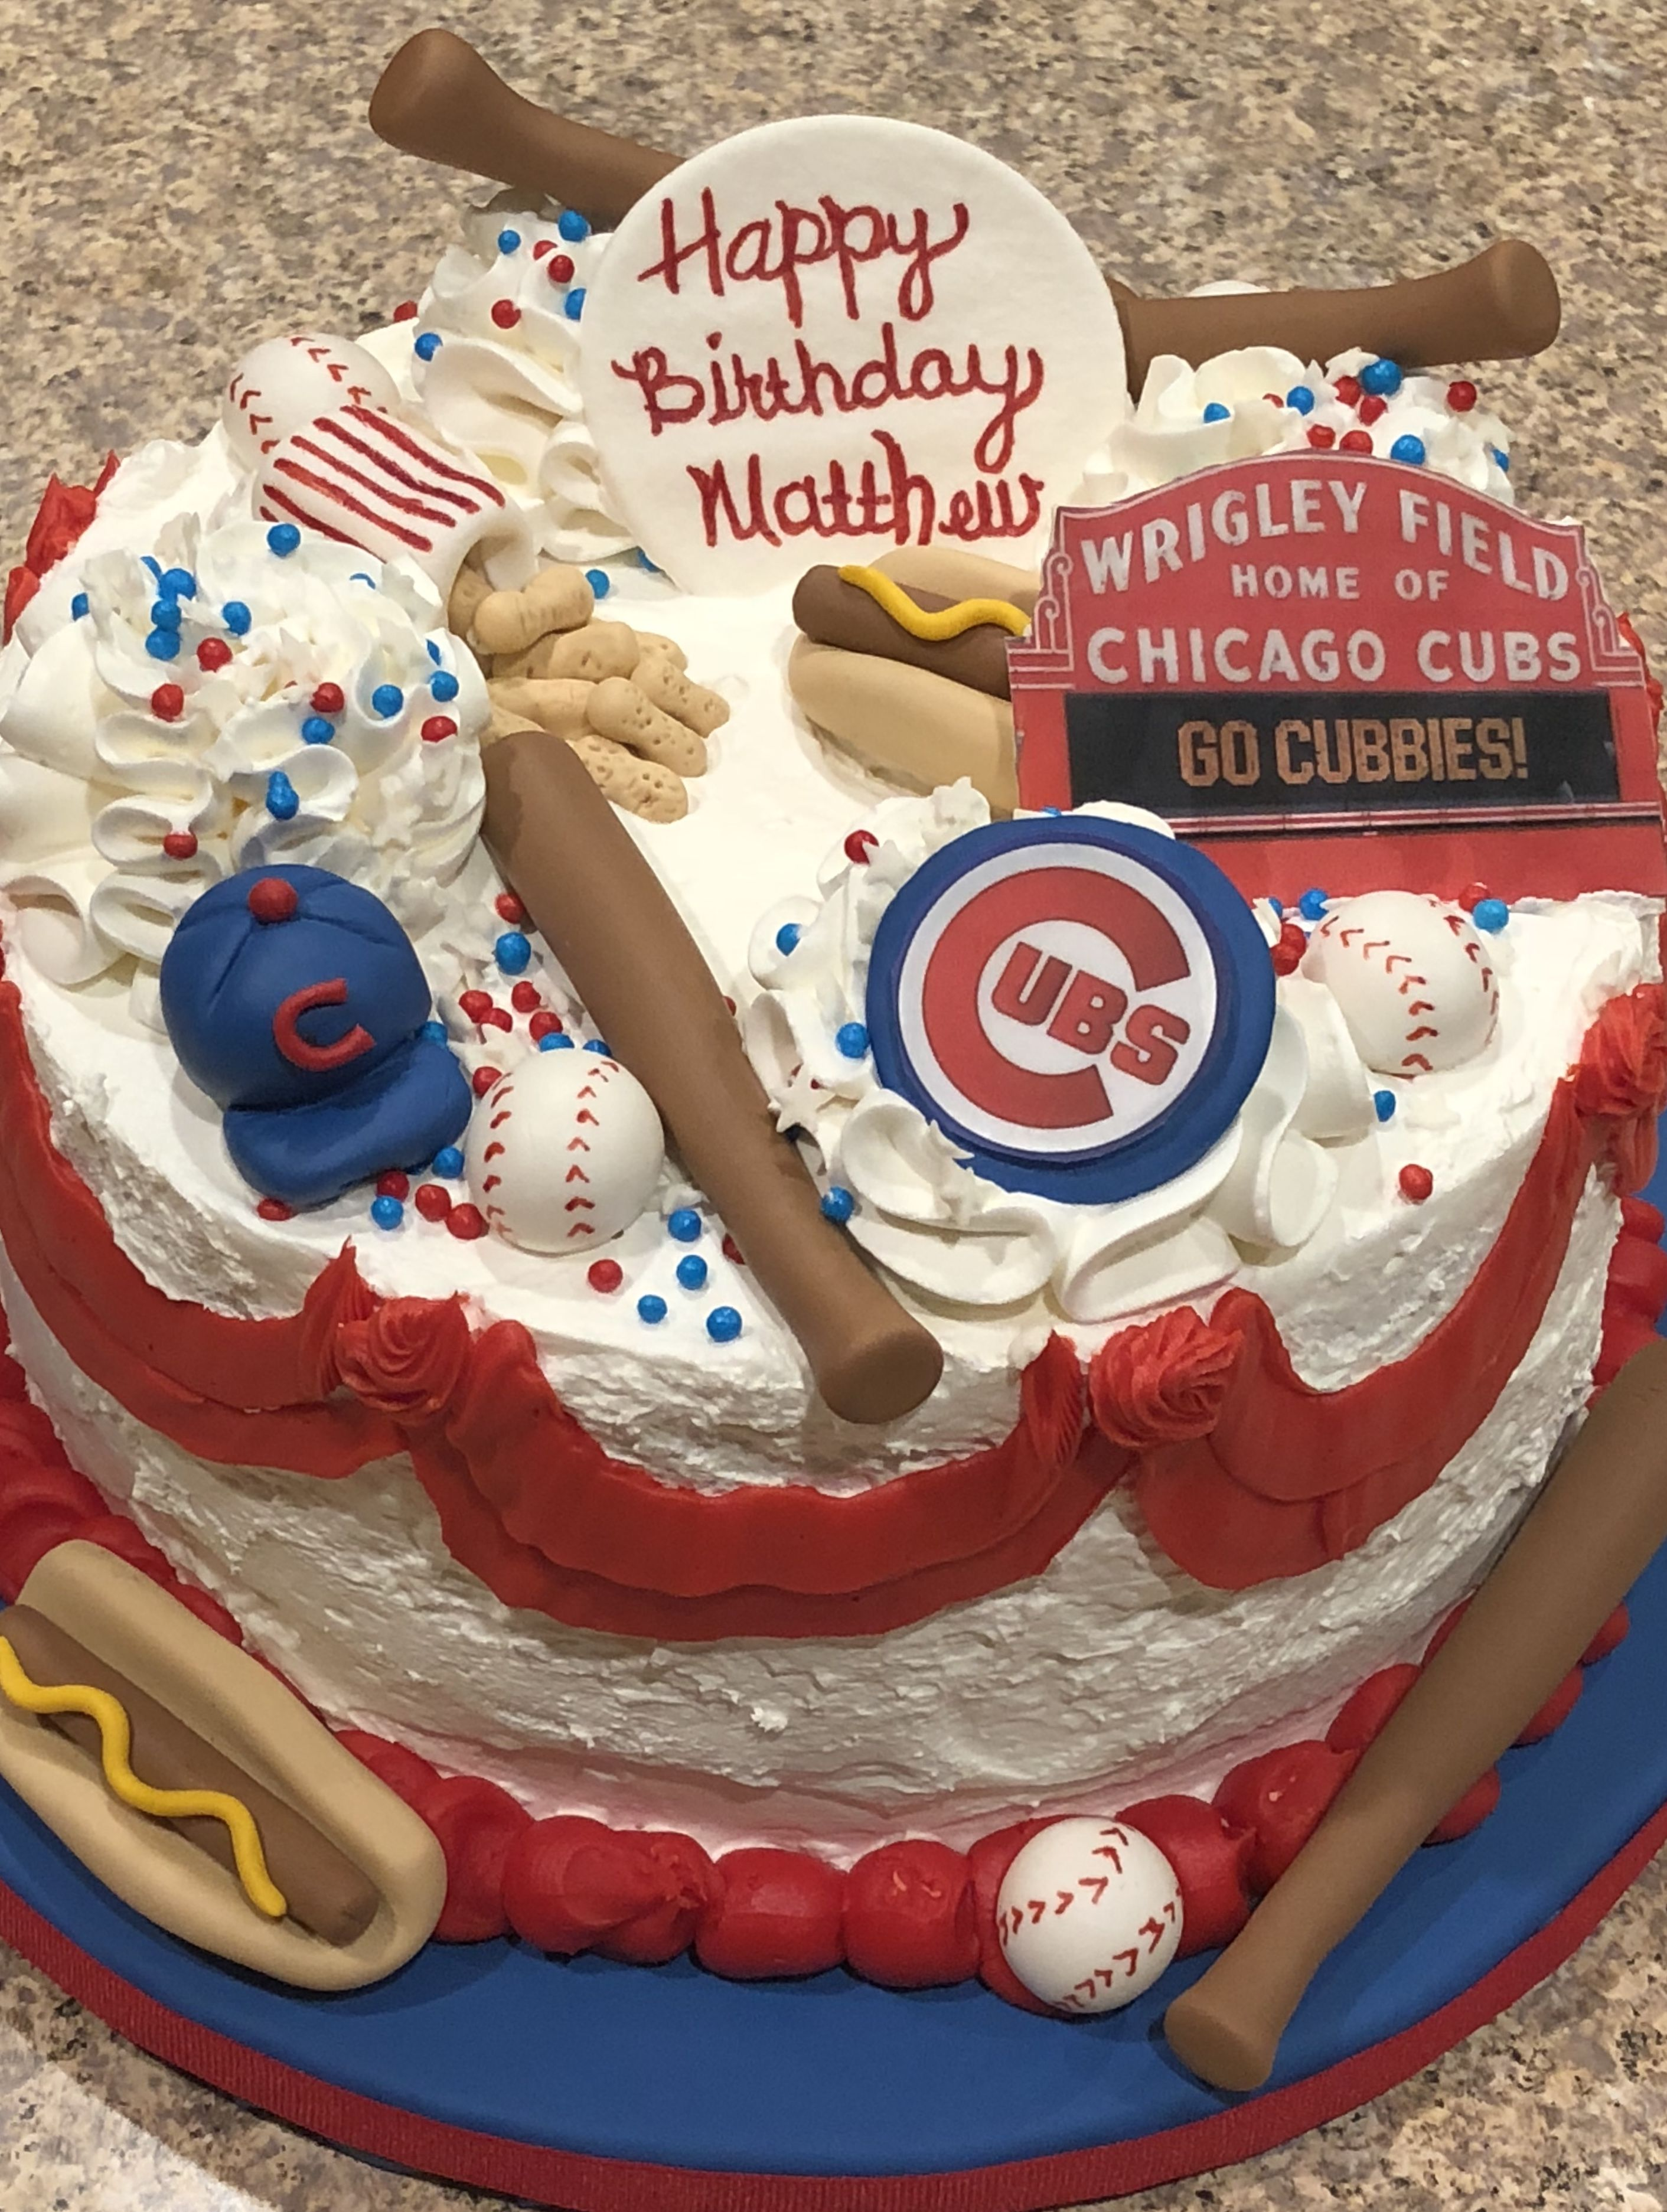 Chicago Cubs Birthday Meme Wwwtopsimagescom